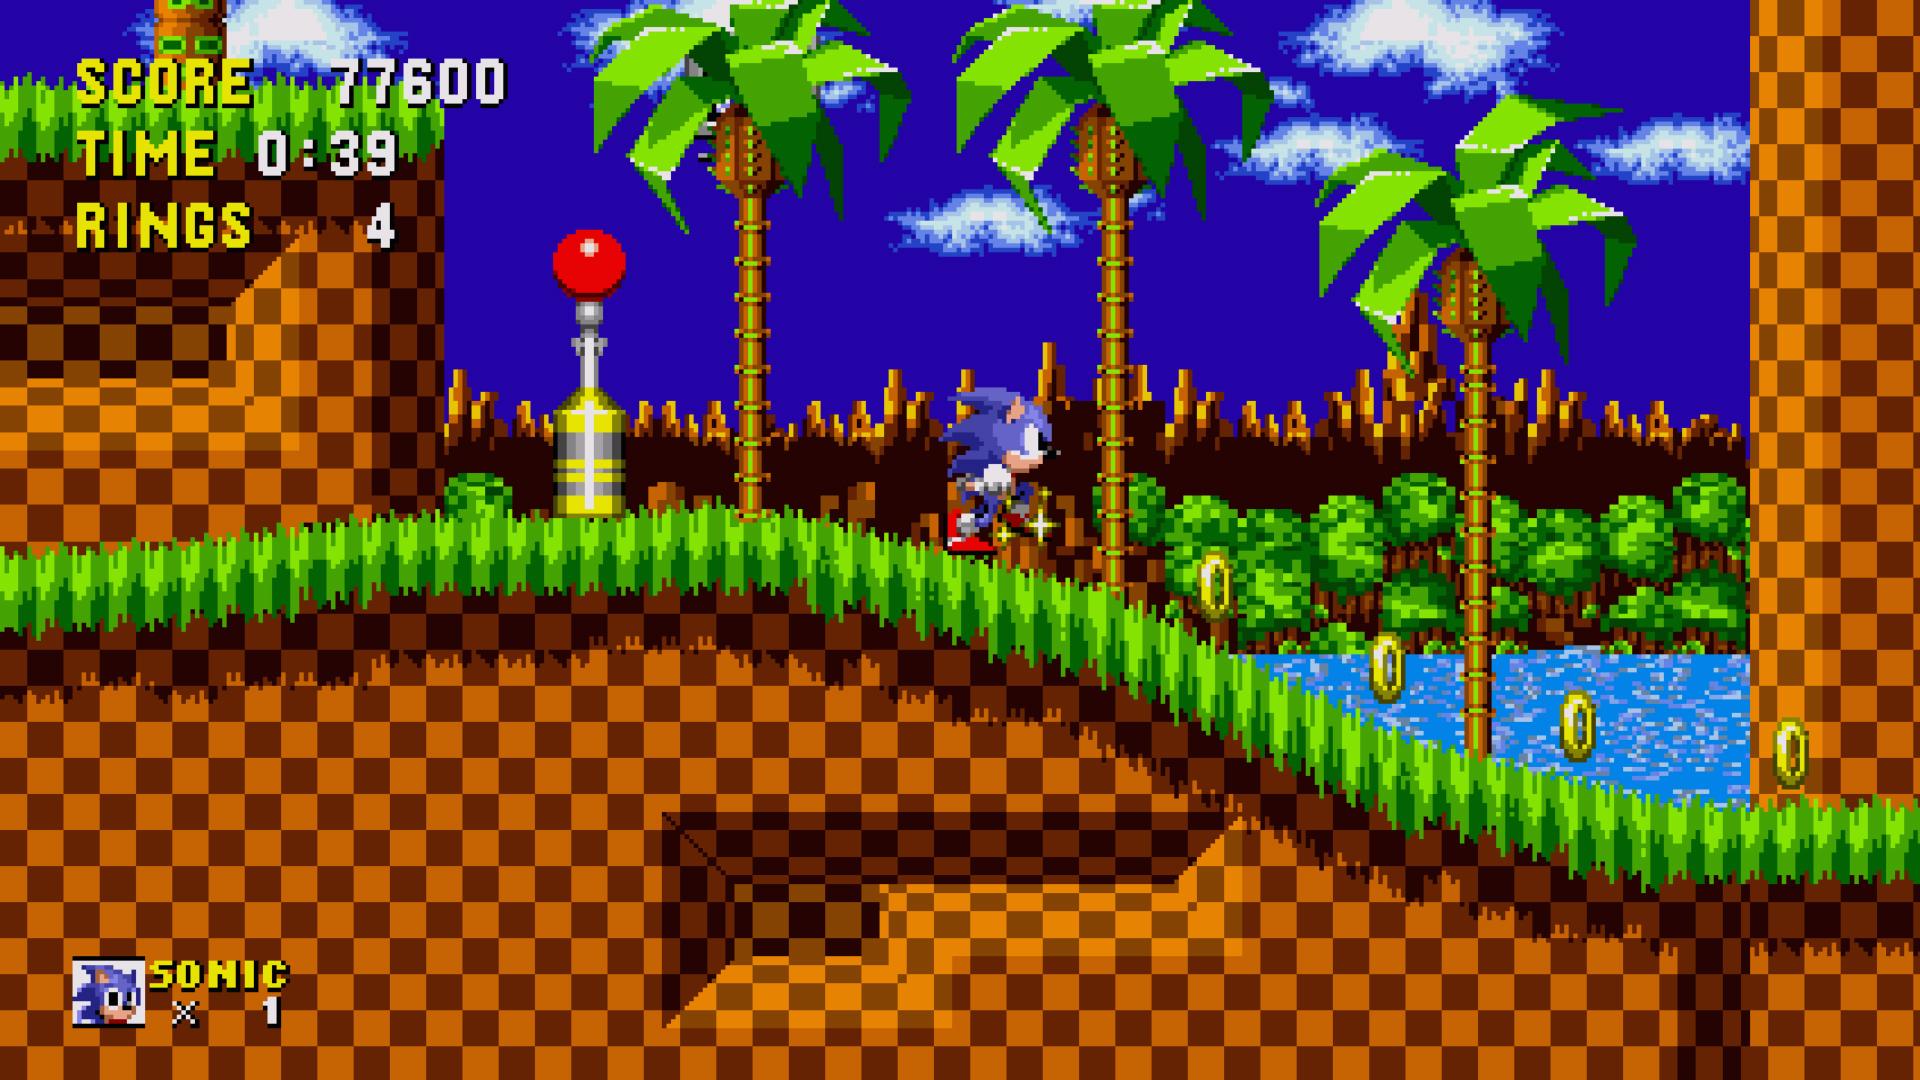 File:Sonic 1 2013 pic 2.jpg